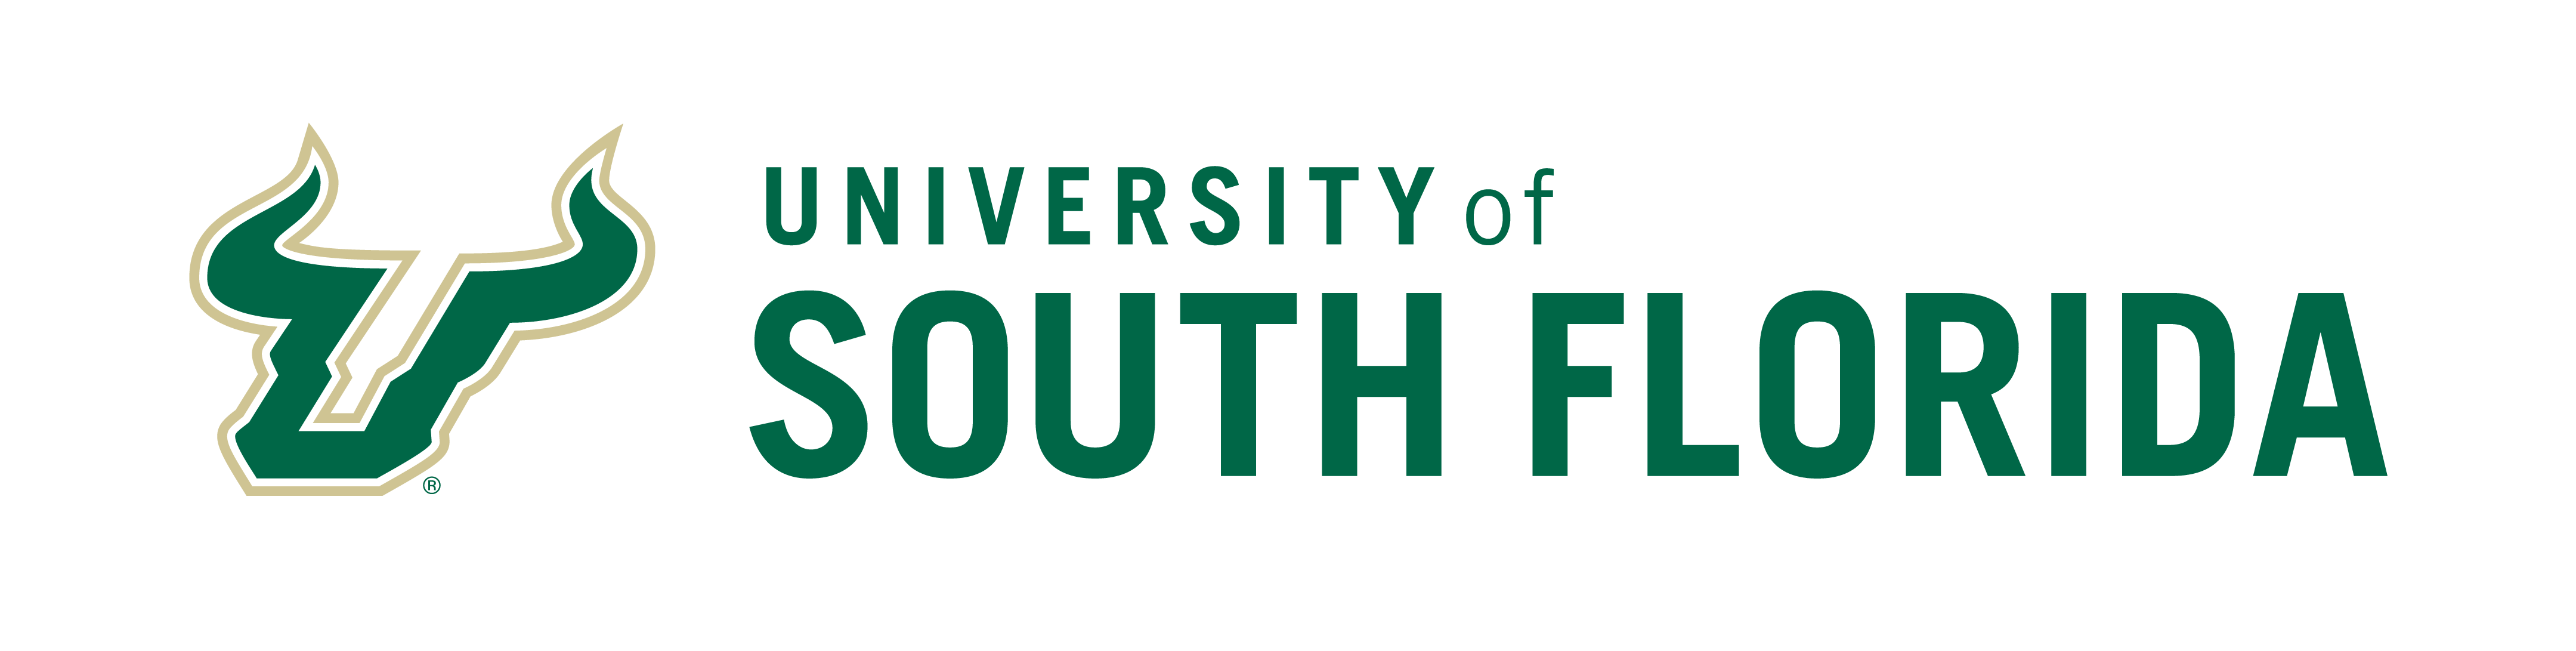 University of South Florida Header Logo